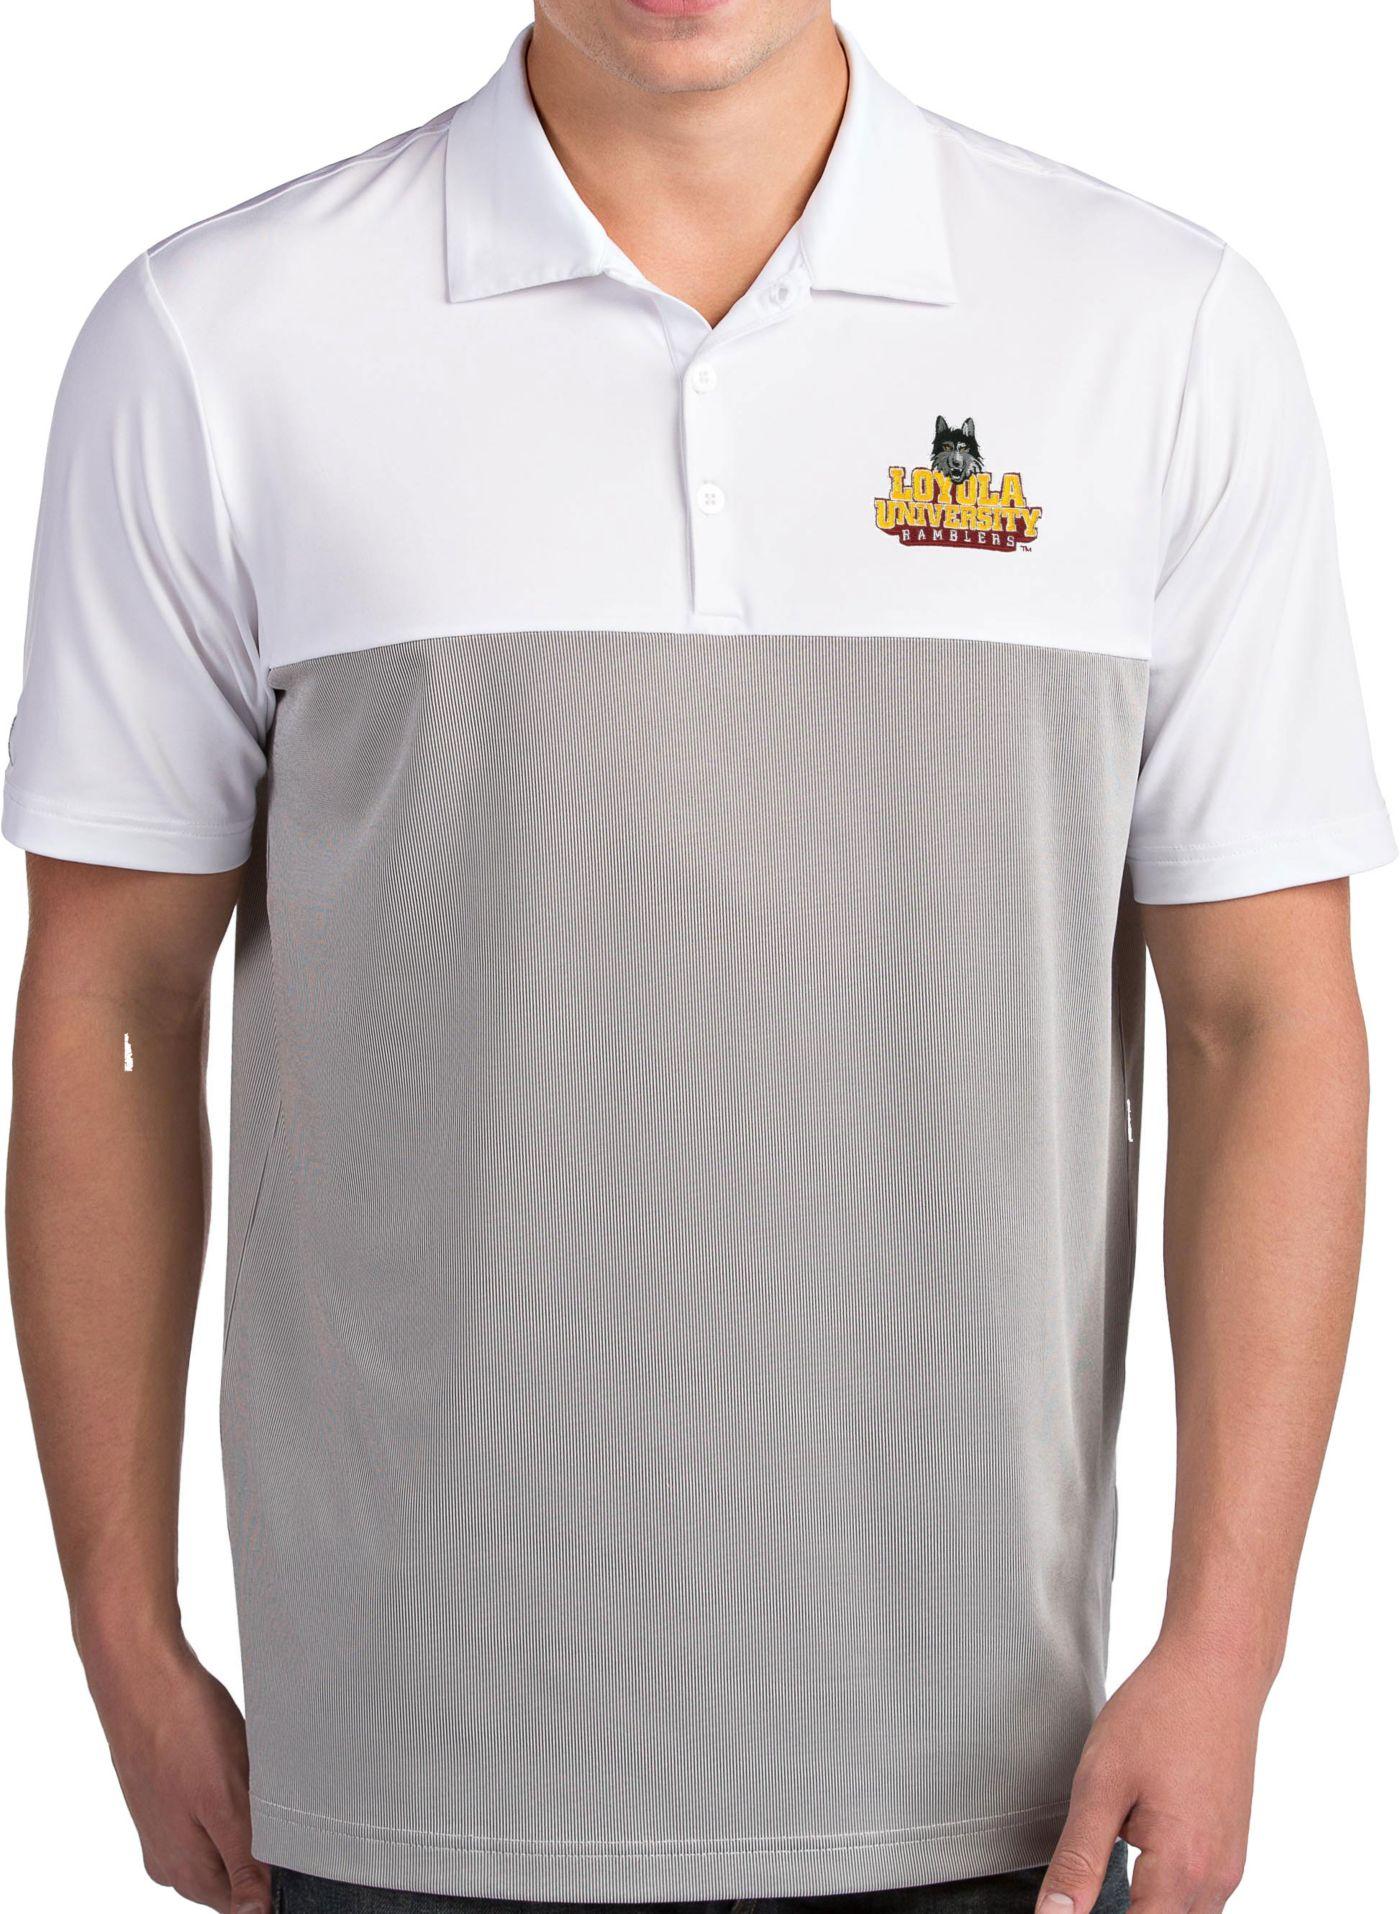 Antigua Men's Loyola - Chicago Ramblers Venture White Polo